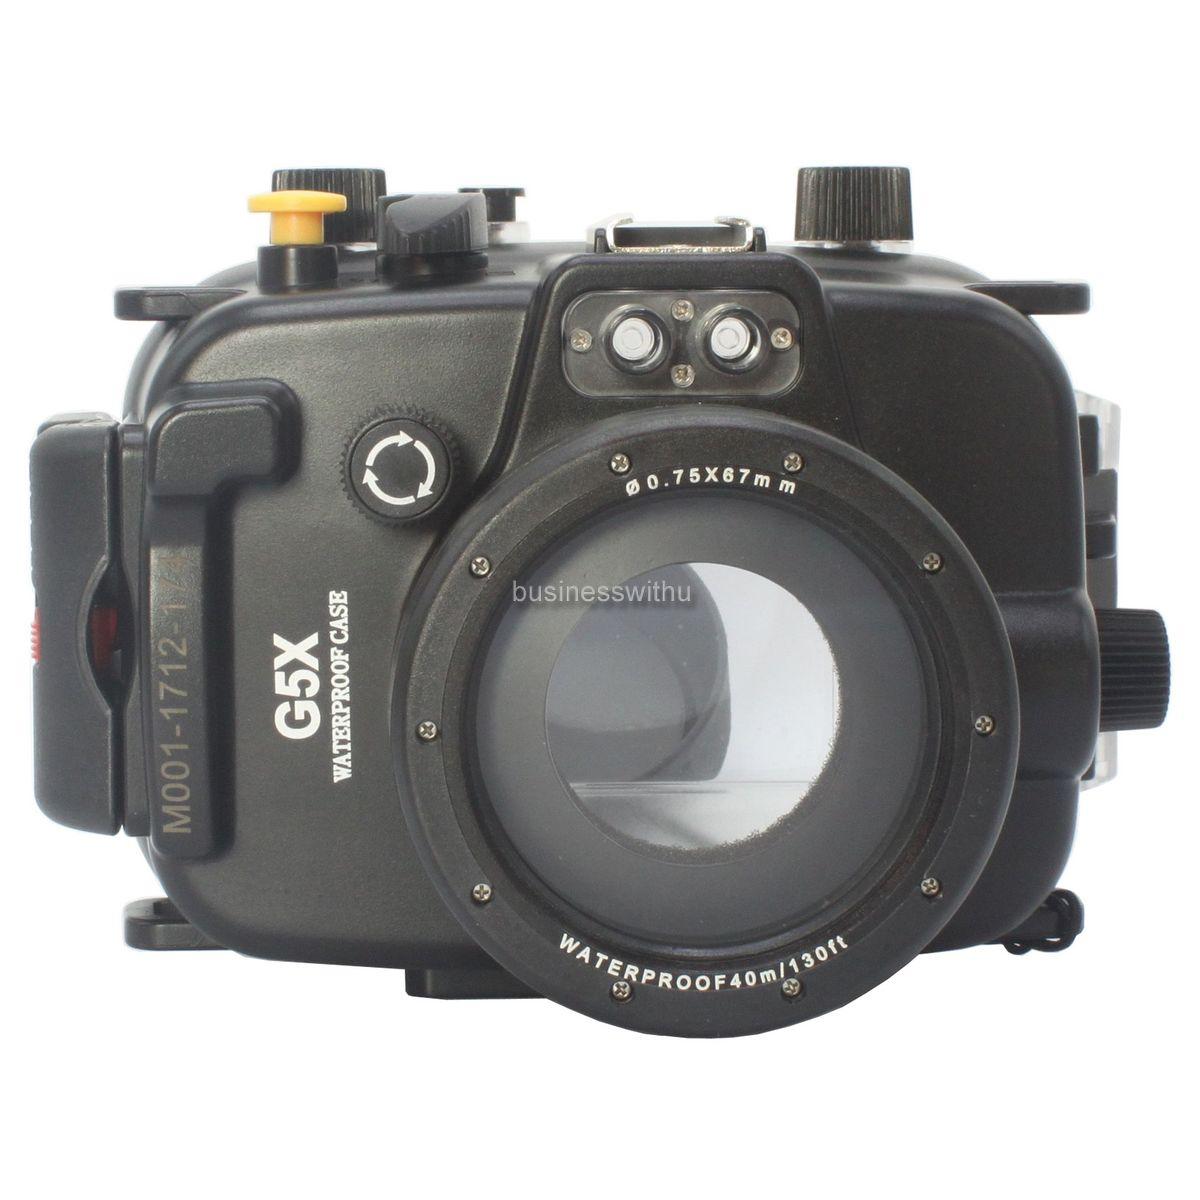 40m 130ft Underwater Diving Waterproof Case Cover For Canon Powershot G5x Kamera Pocket